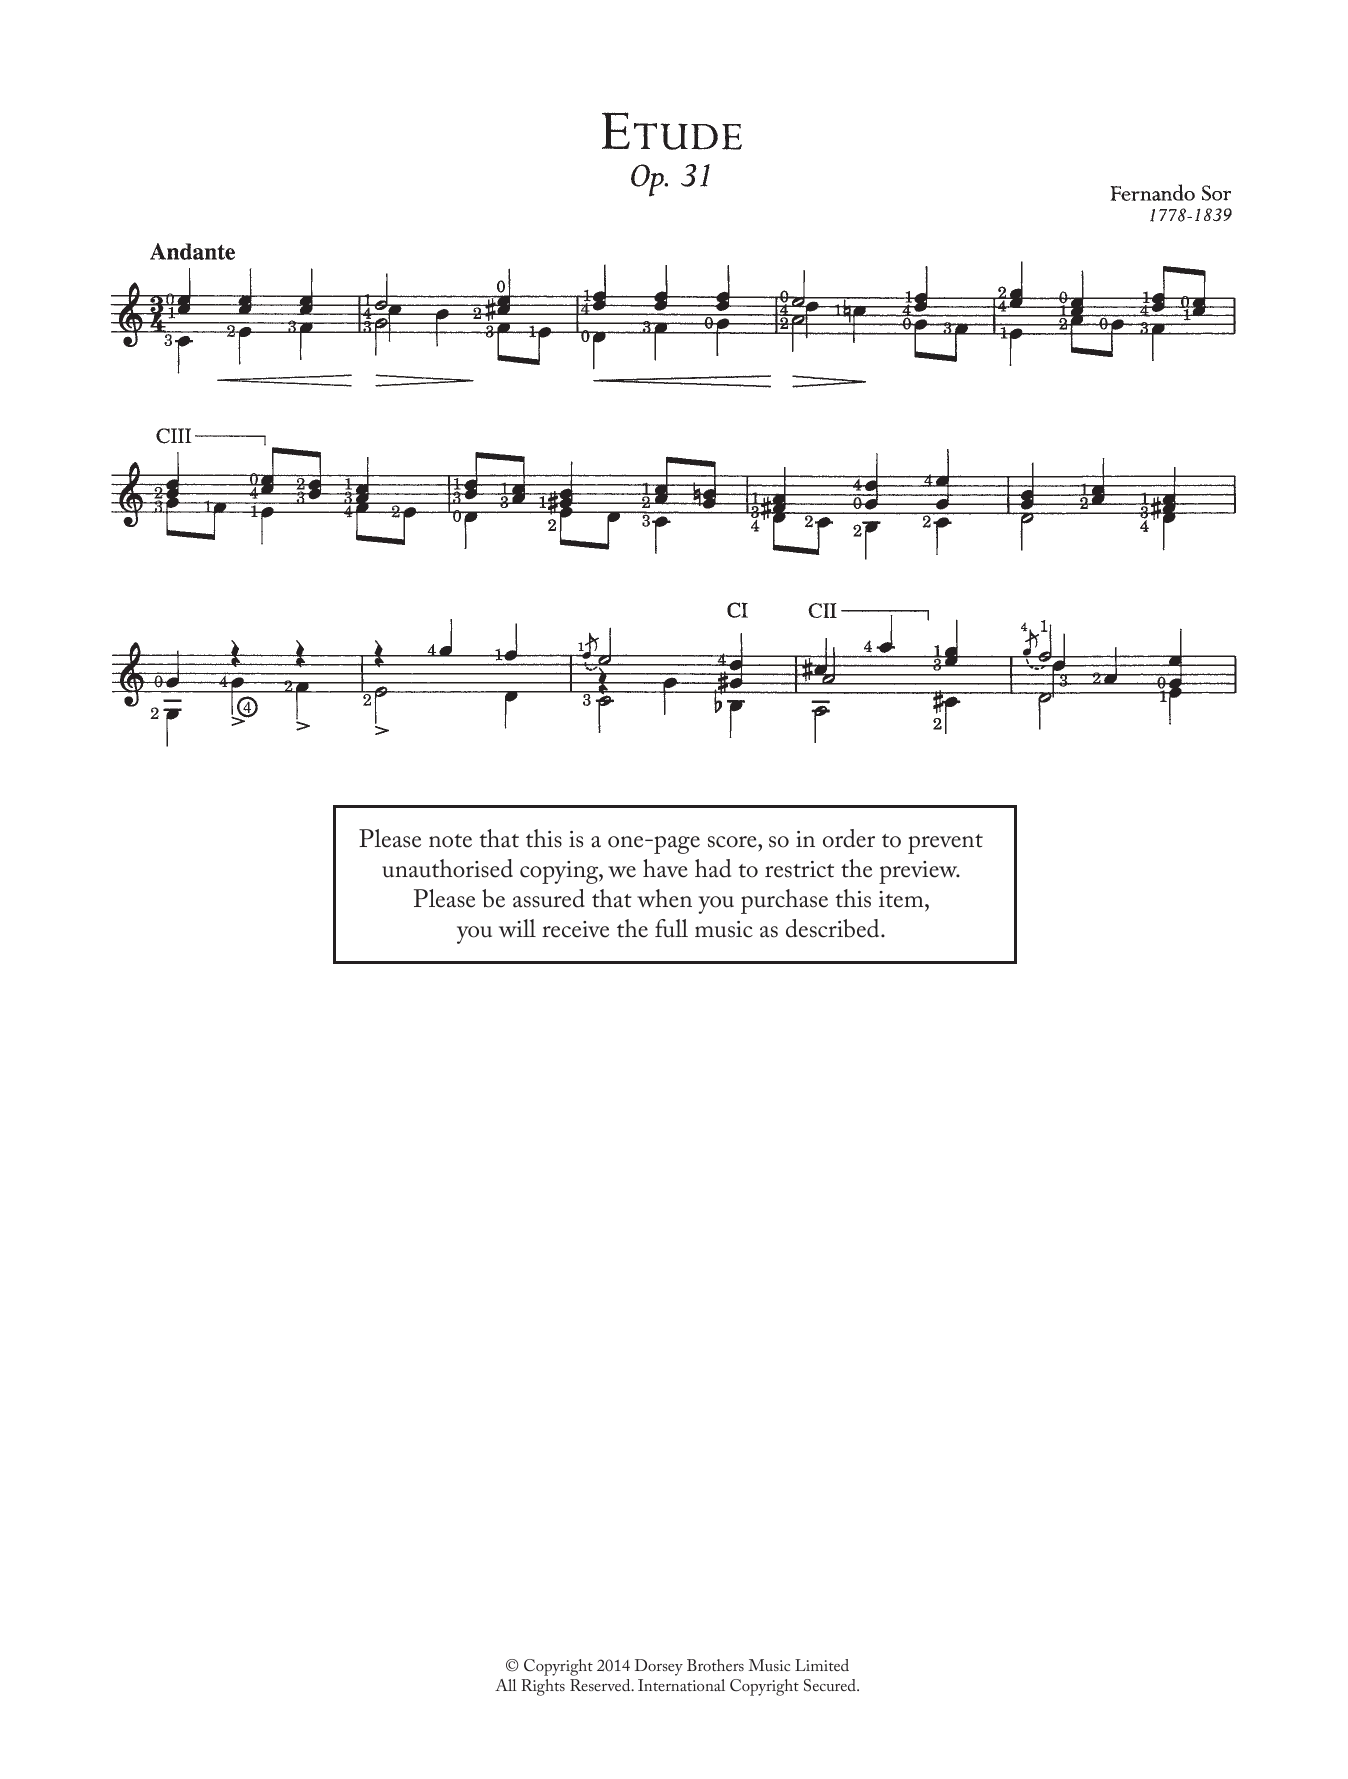 Fernando Sor - Etude, Op.31